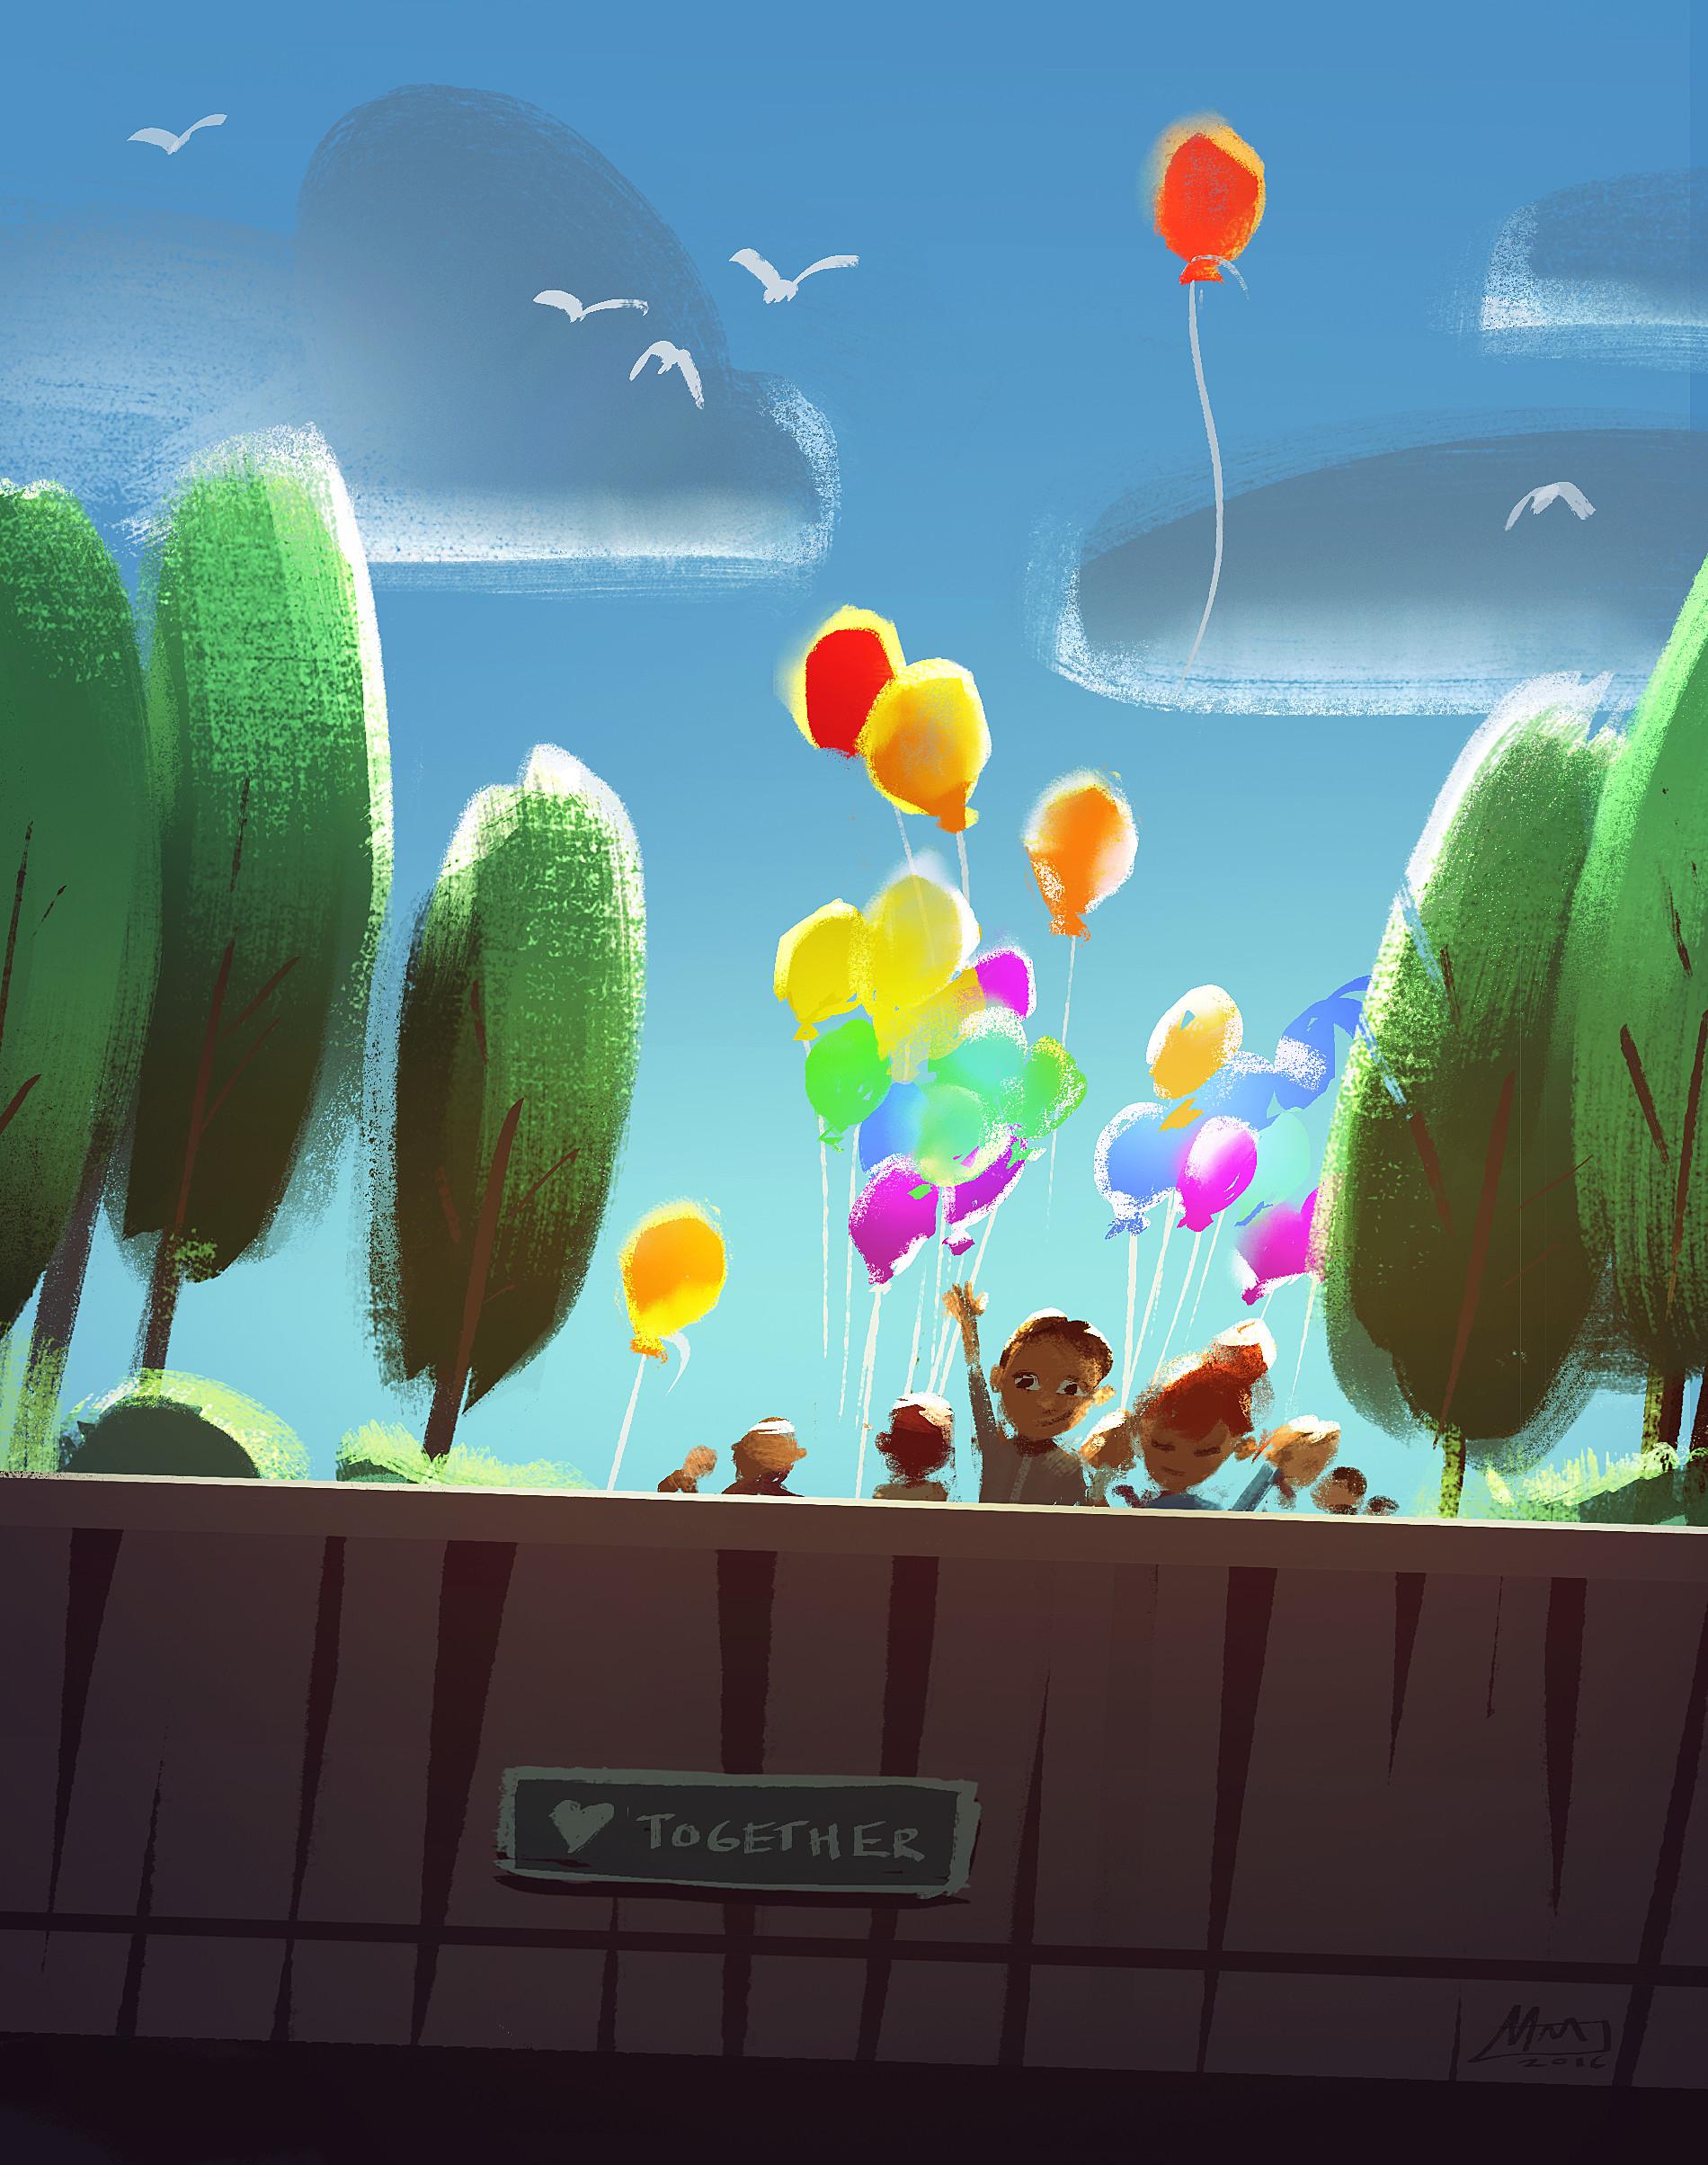 Mike mccain balloons